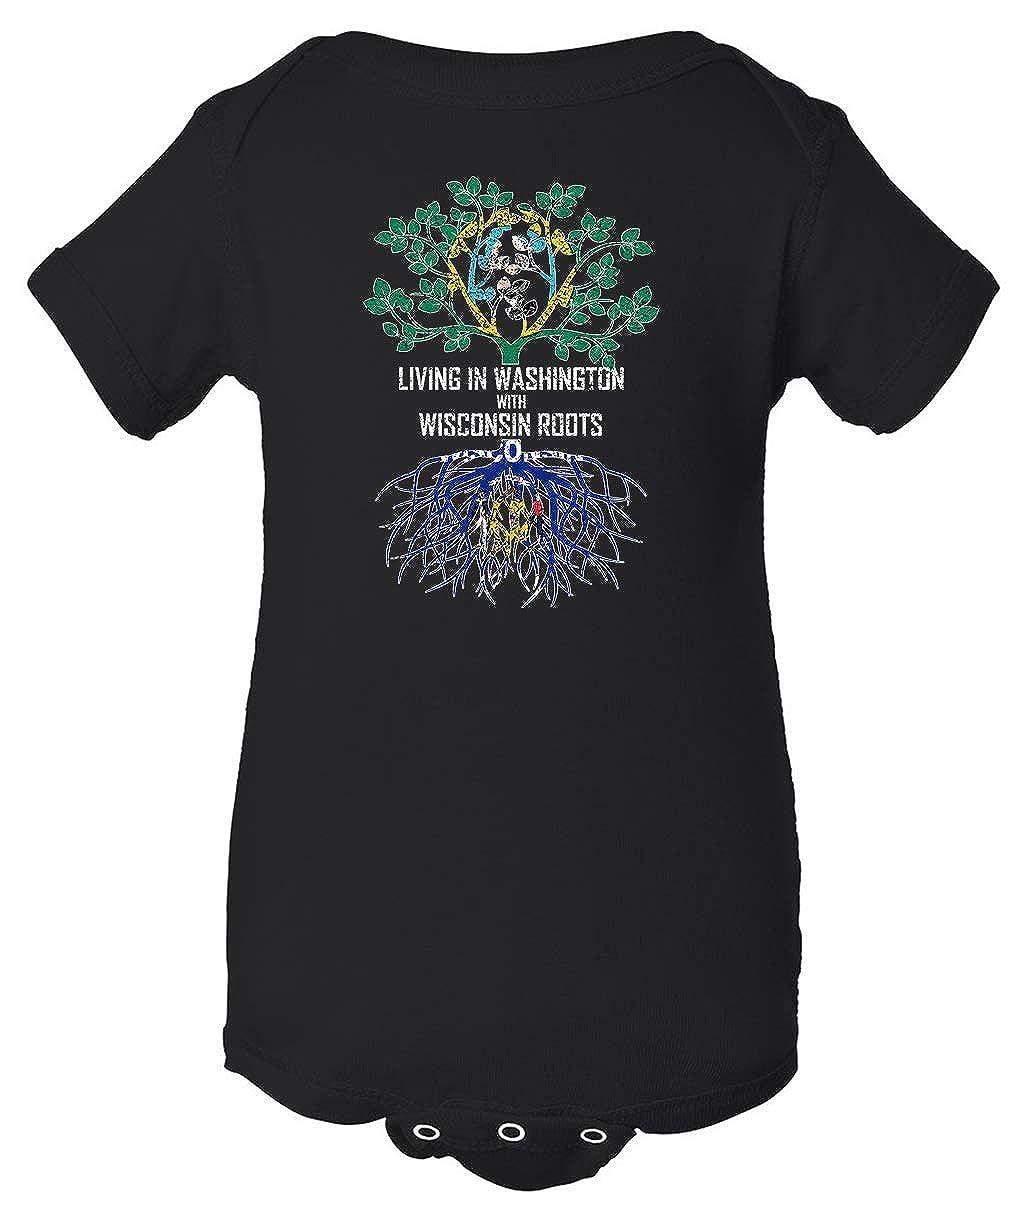 Tenacitee Babys Living in Washington Wisconsin Roots Shirt